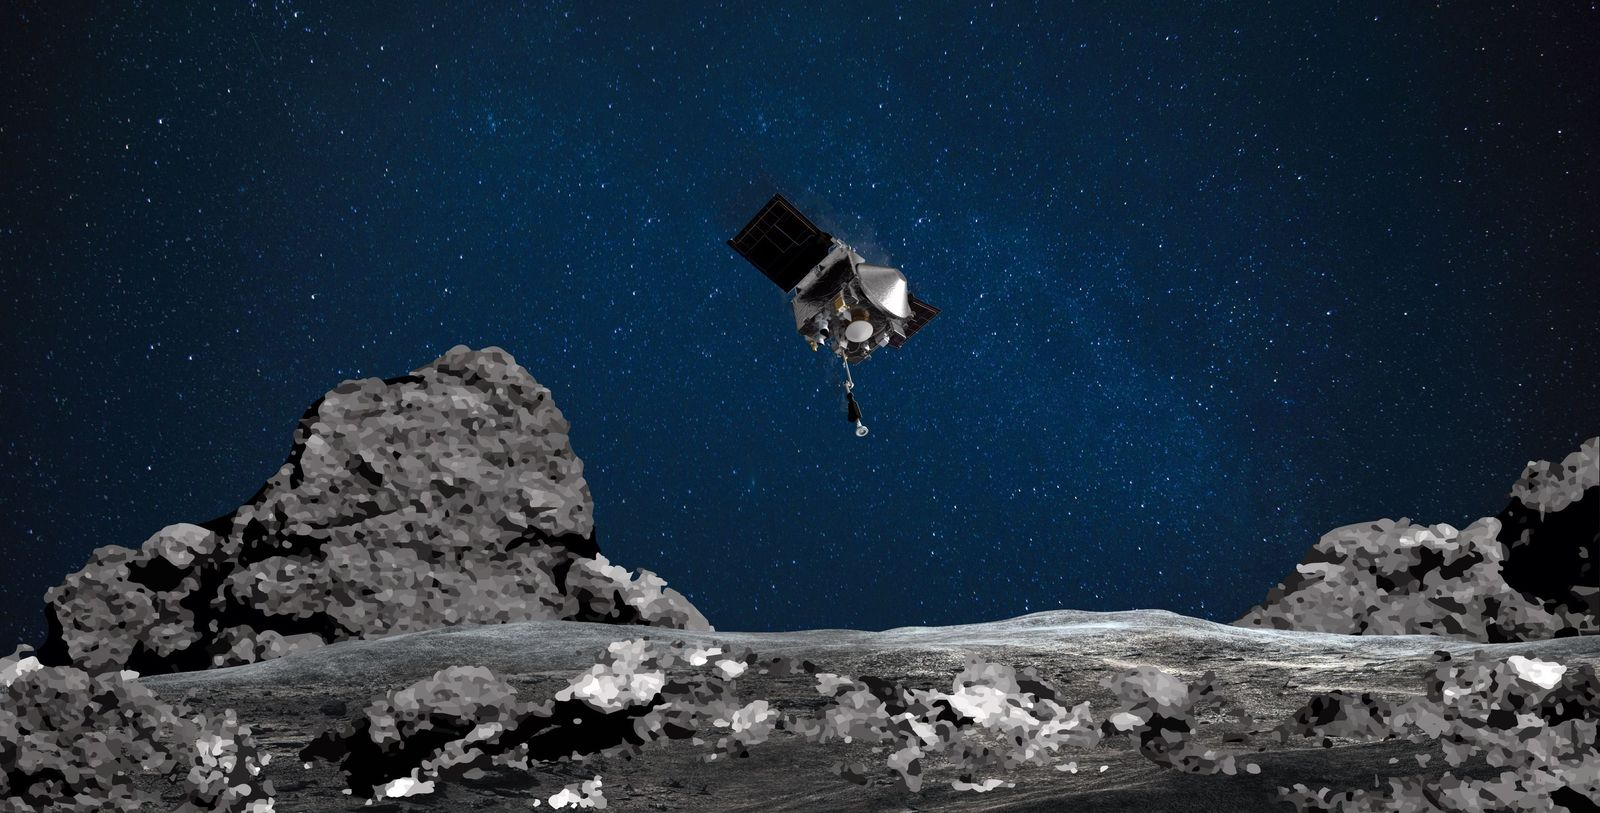 FILES-US-ASTRONOMY-SPACE-AEROSPACE